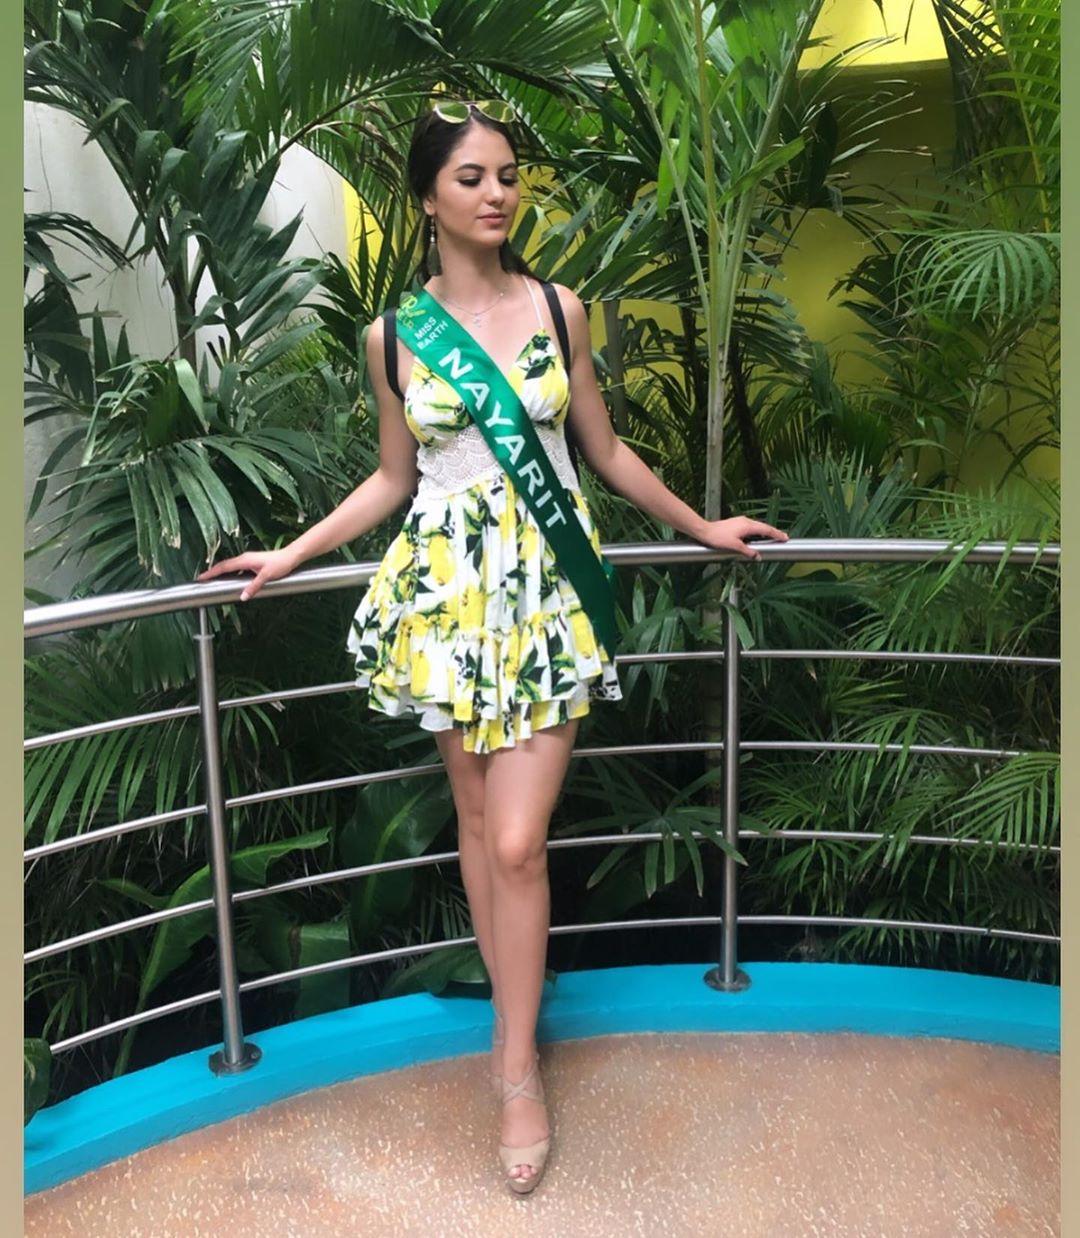 hilary islas, miss earth mexico 2019. - Página 6 60454610